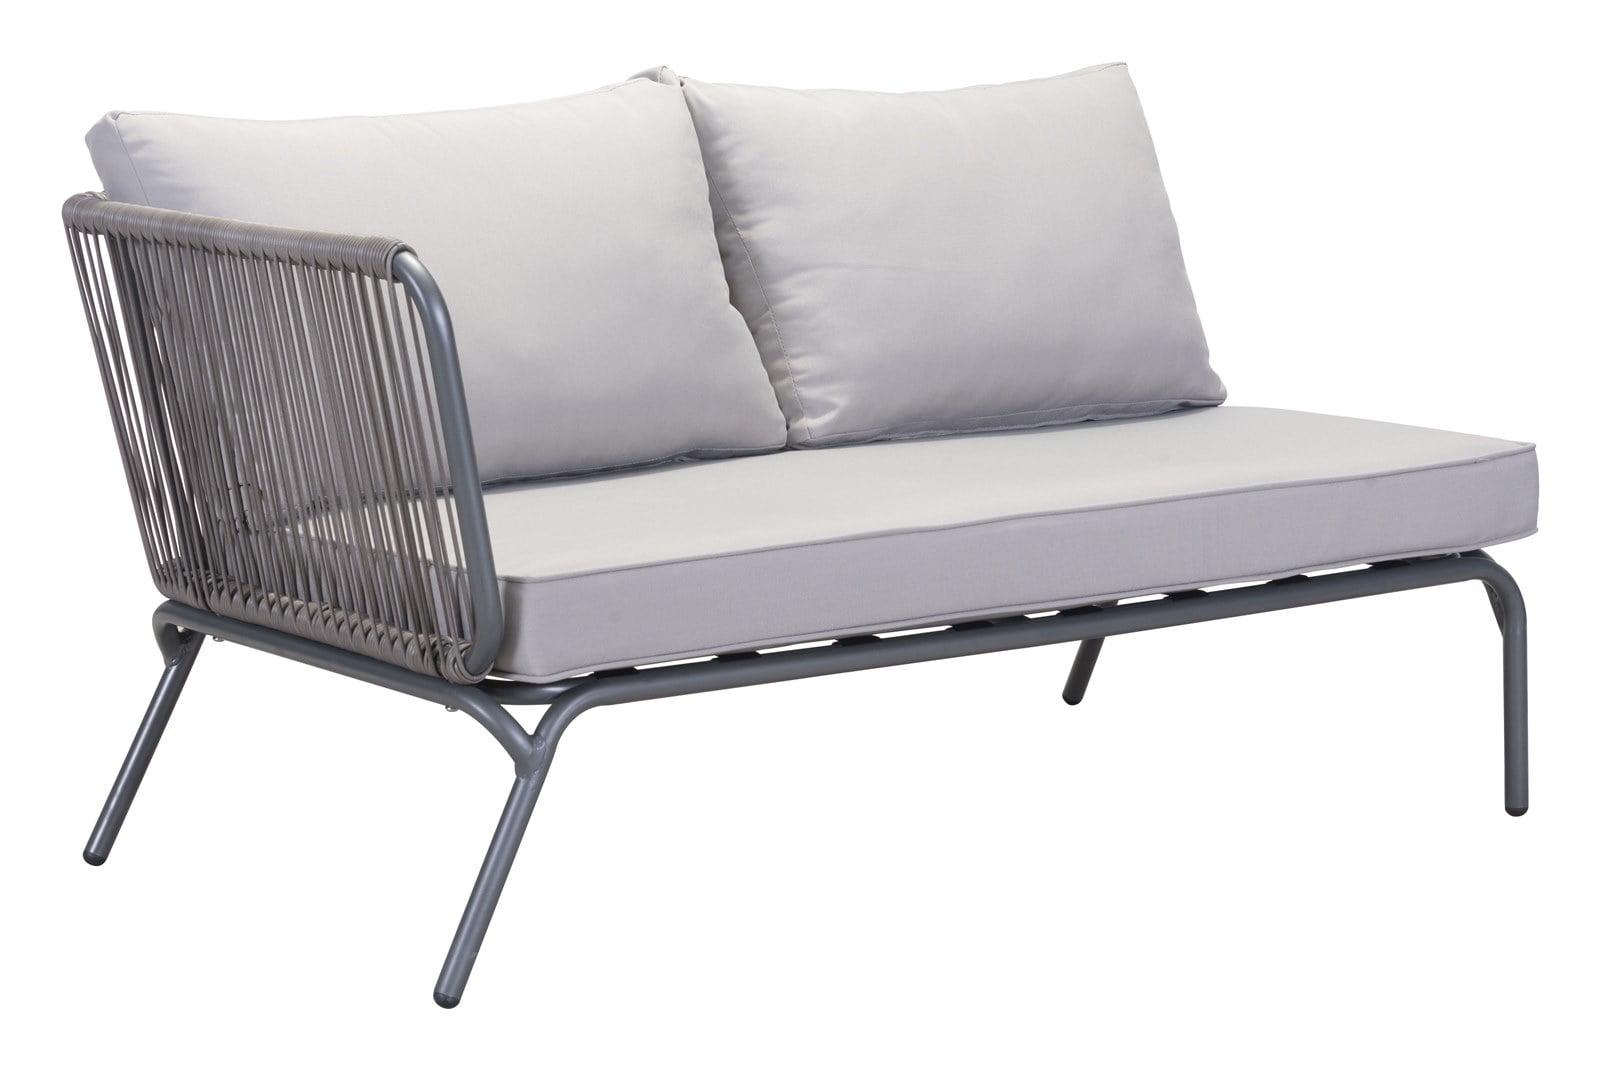 Modern Contemporary Urban Outdoor Patio Balcony Corner Sofa Chair Grey Sunproof Fabric Synethetic Weave Aluminum Walmart Com